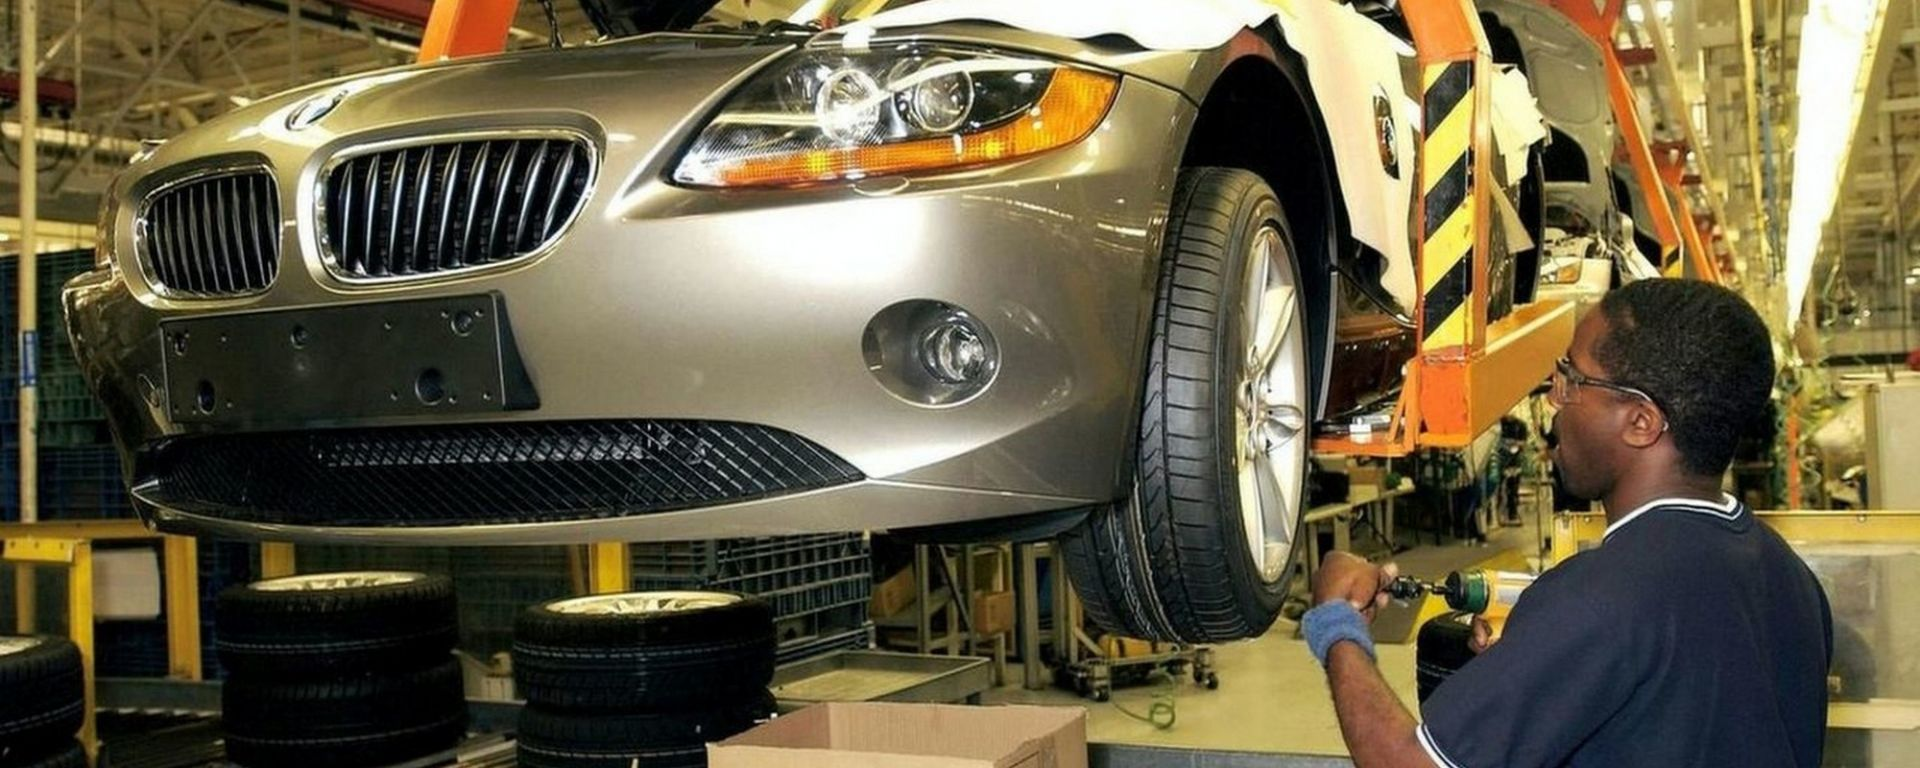 Un operaio nella fabbrica BMW di Spartanburg, South Carolina